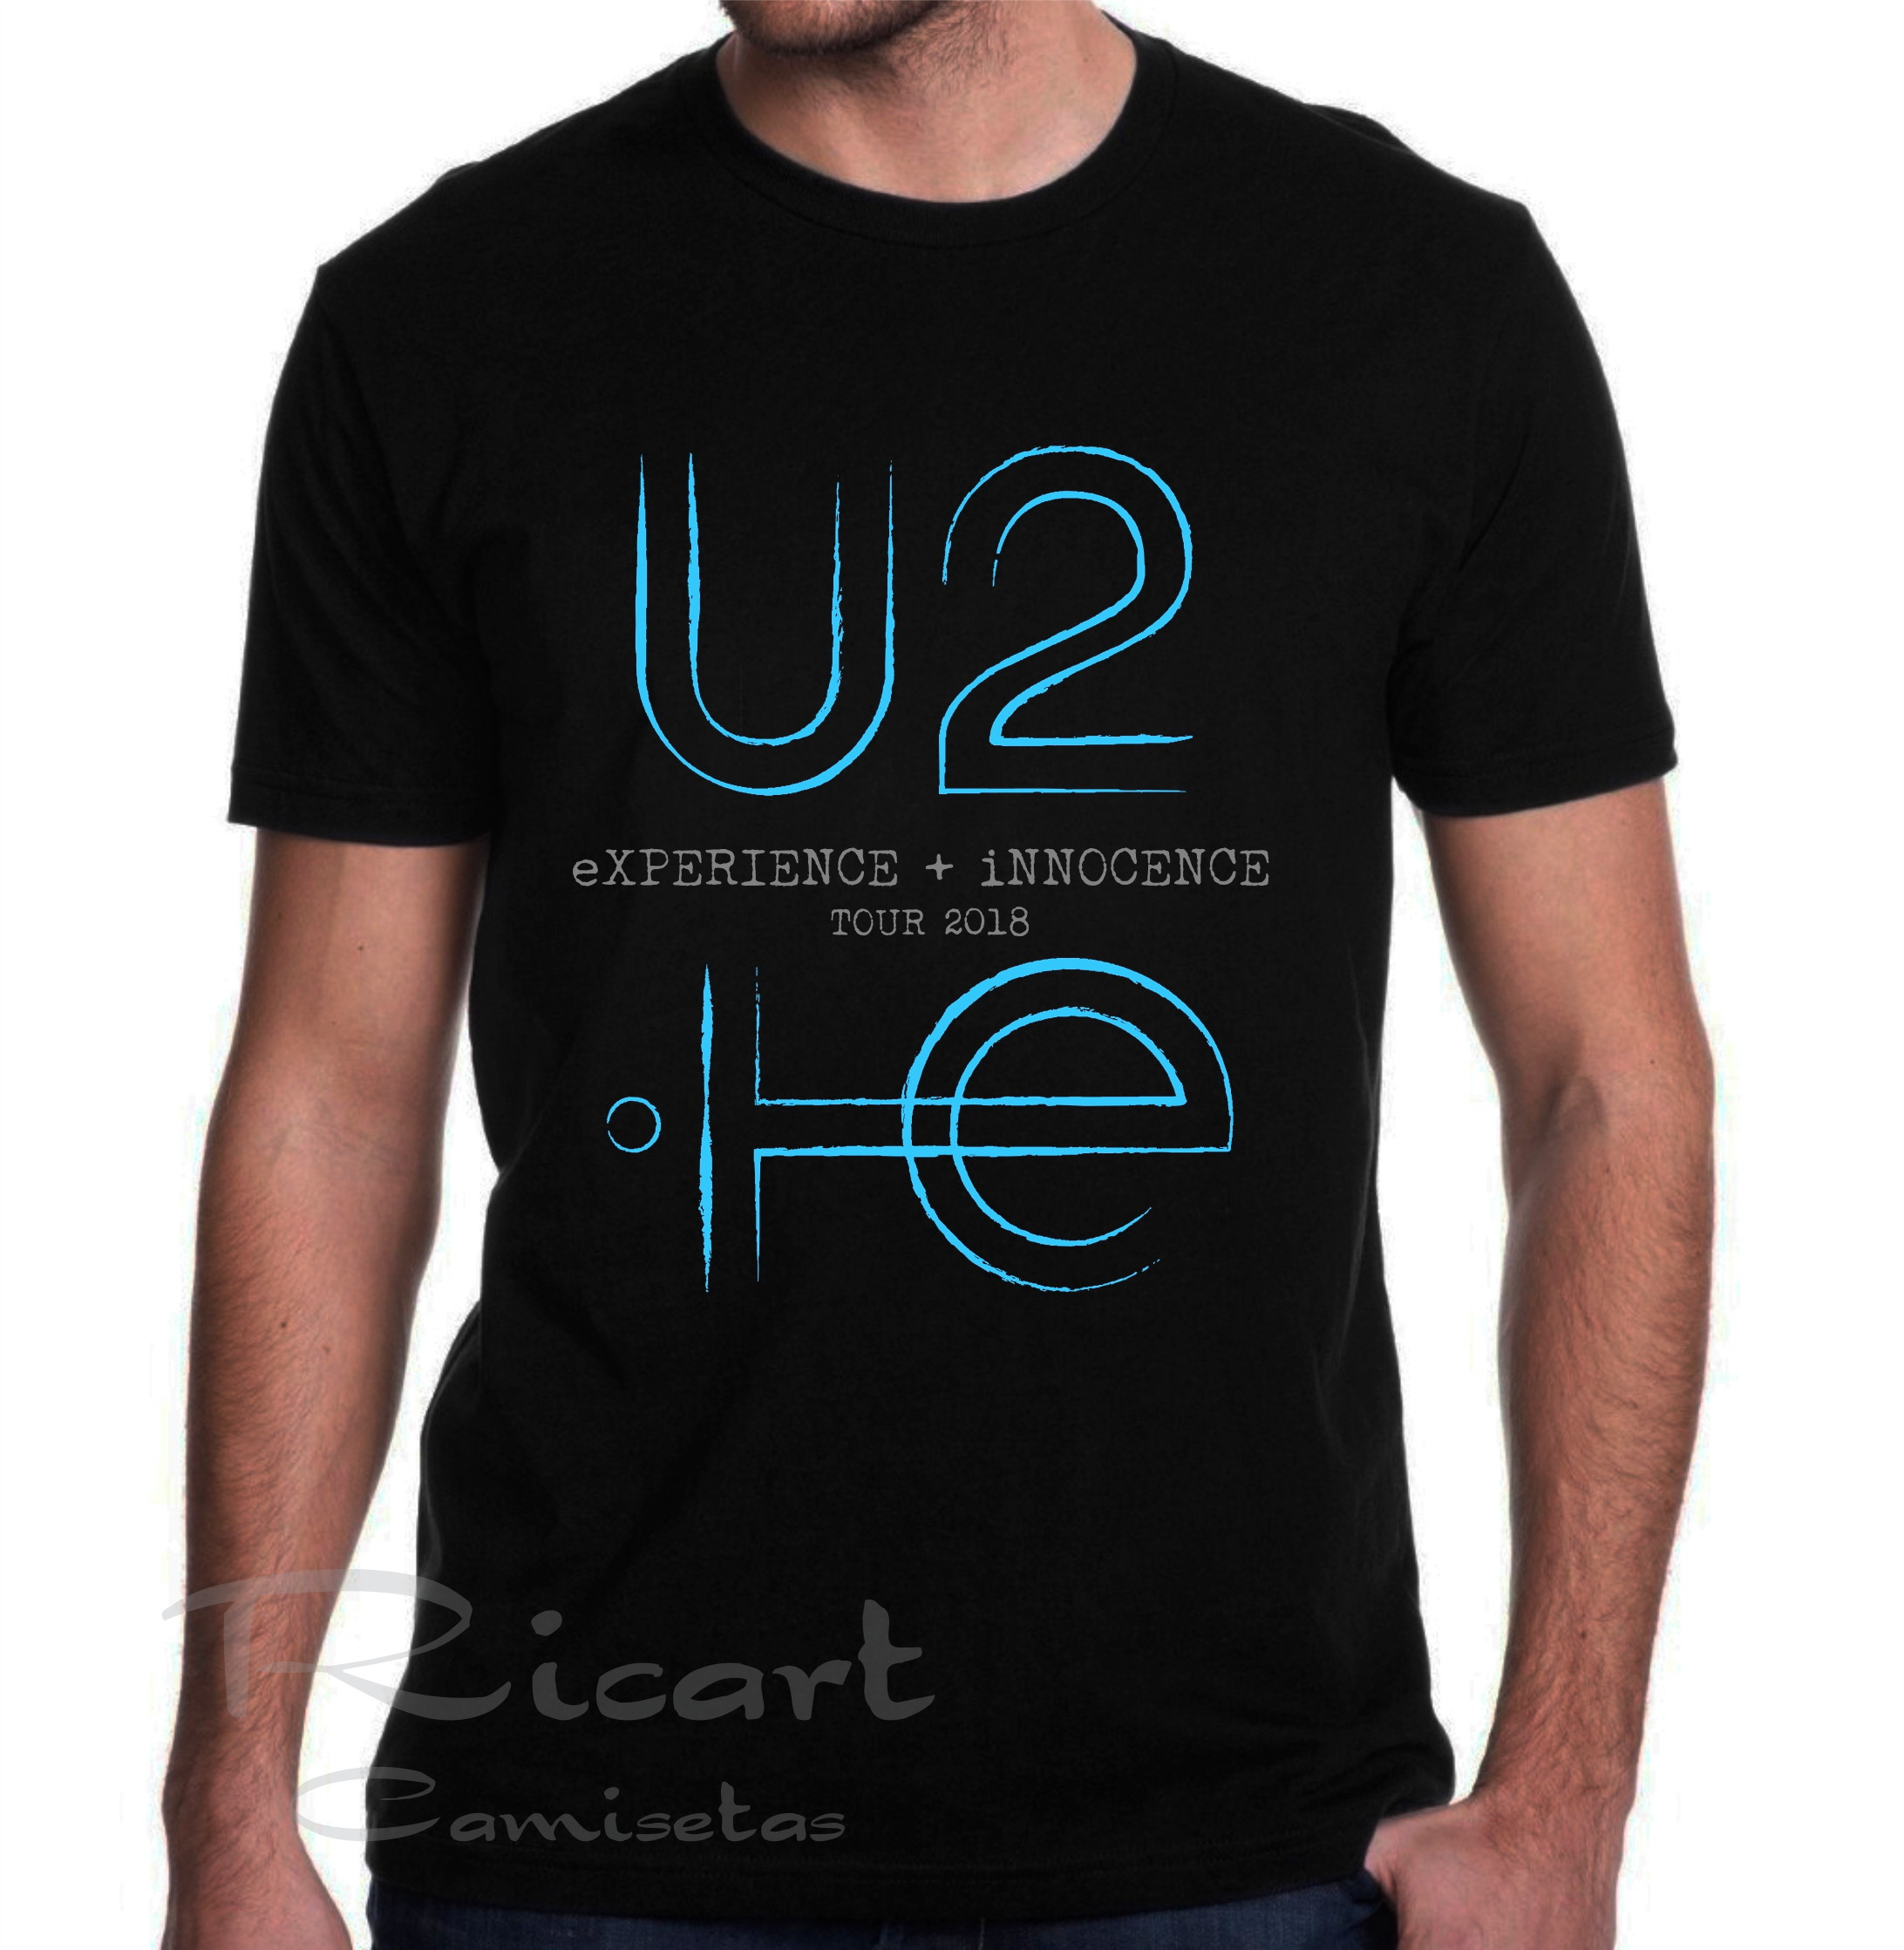 Camiseta da Banda Irlandesa U2  3b16abef5d96a